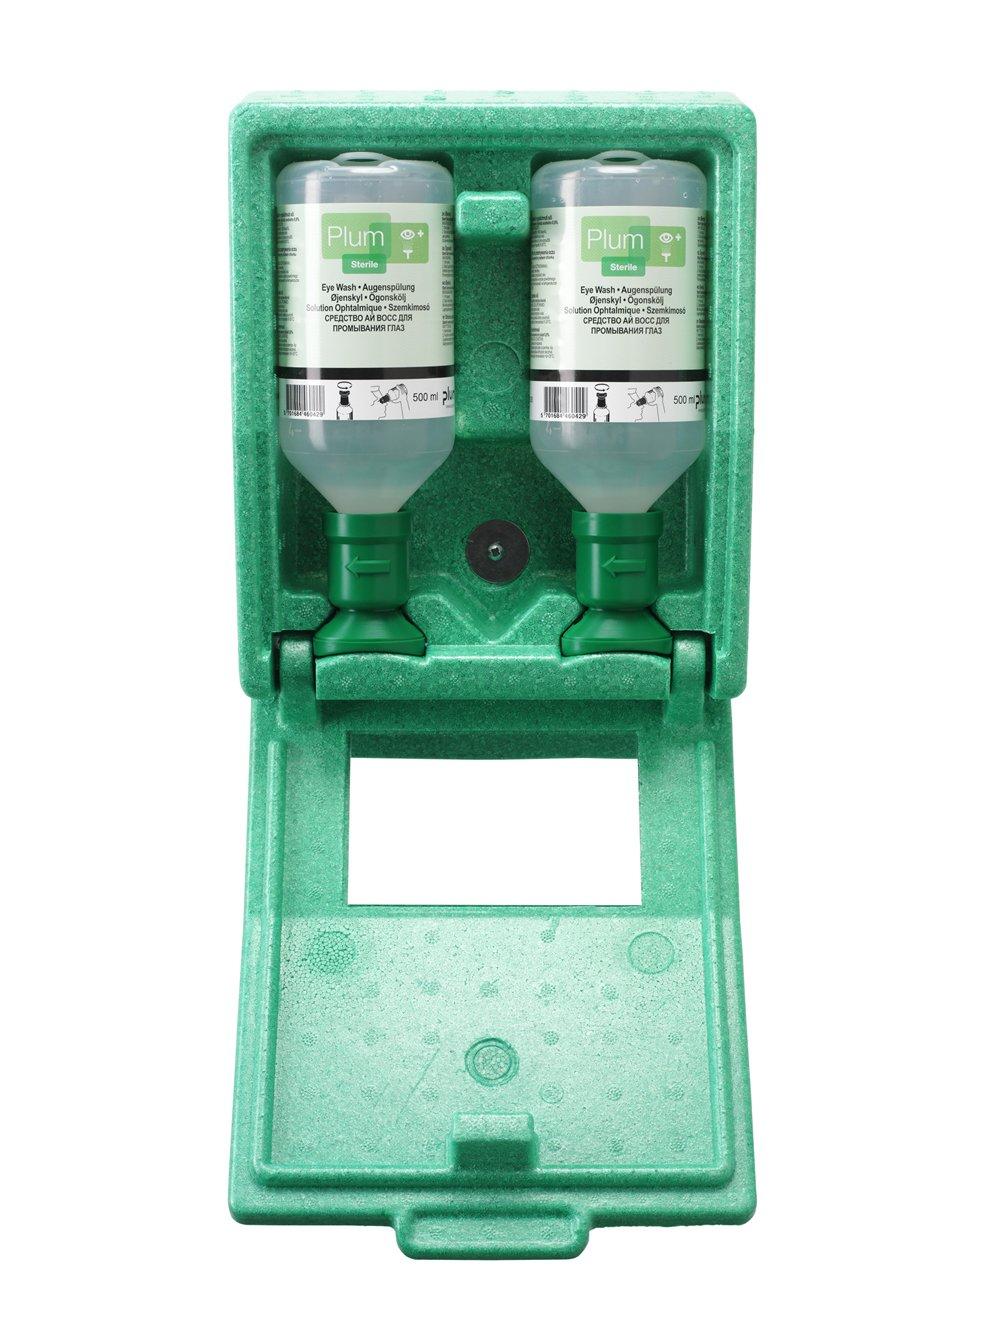 Plum 45852 Small Eyewash Station, 11'' Height, 4.75'' Wide, 8.5'' Length, 16.9  fl. oz., Polystyrene